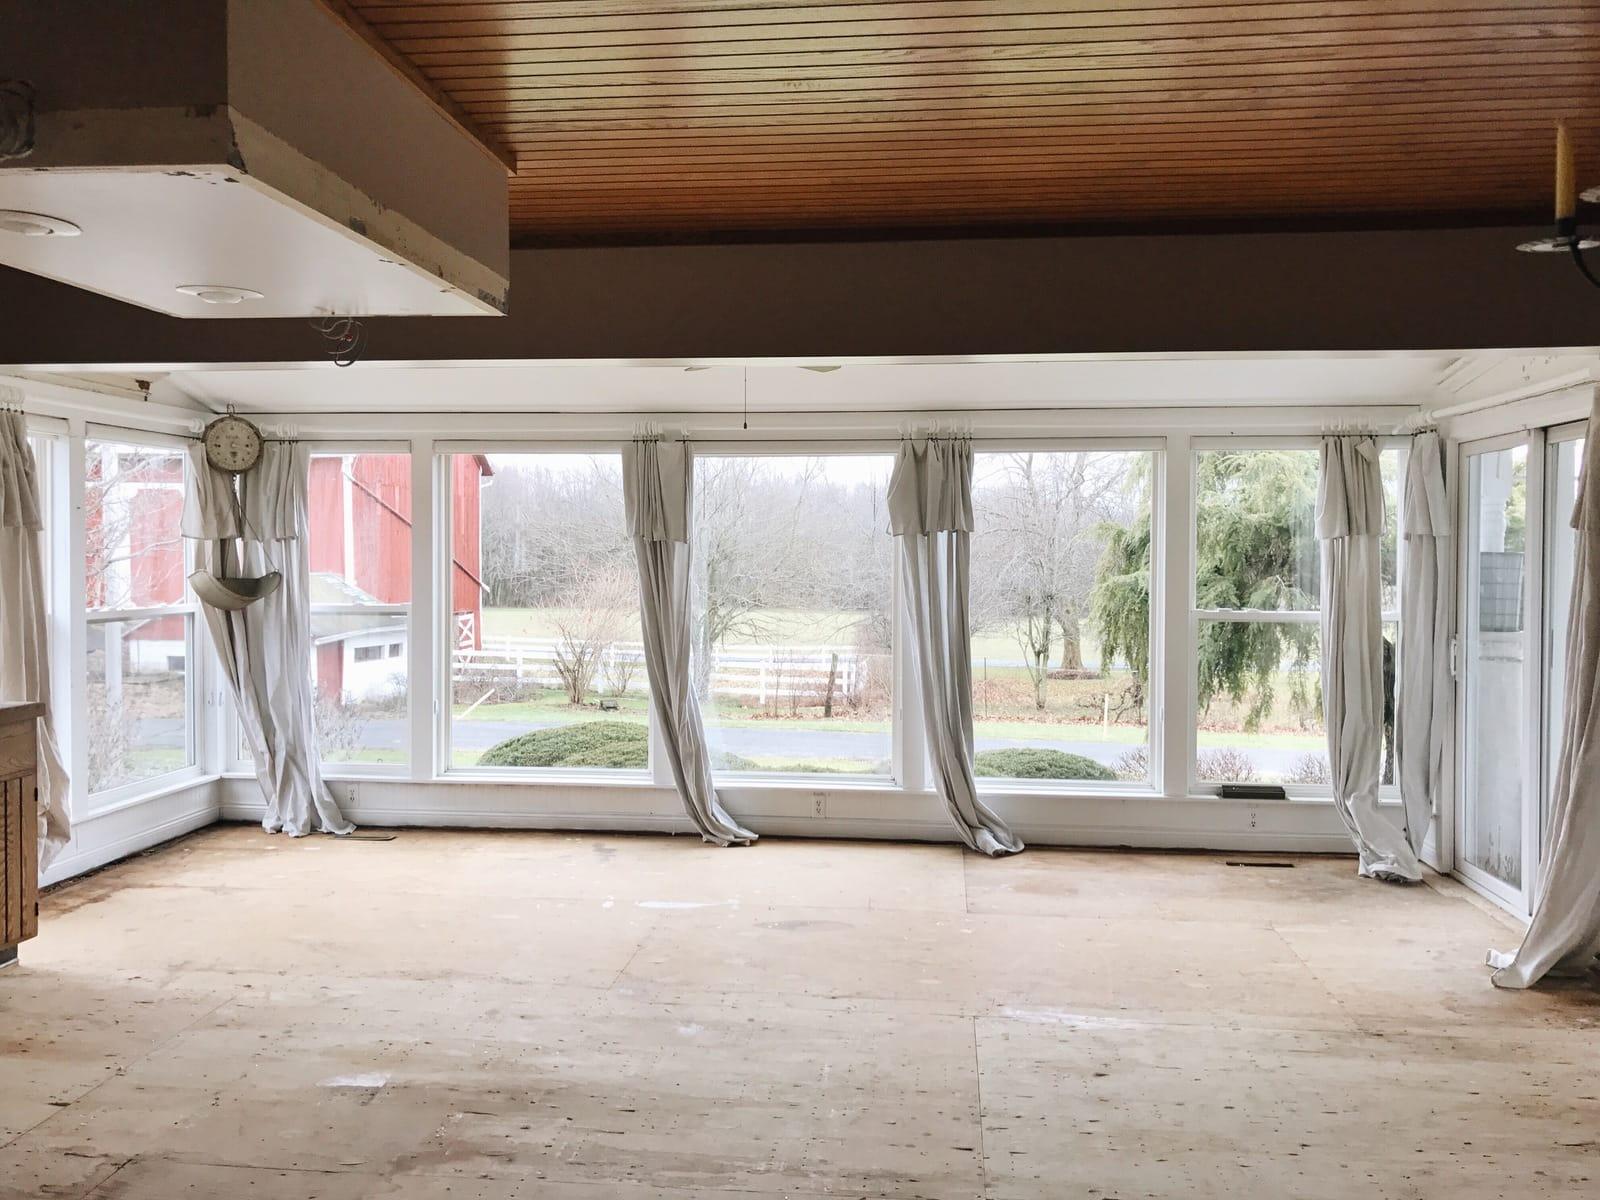 Sunroom & Kitchen Demo- The Floors are Gone! - Liz Marie Blog